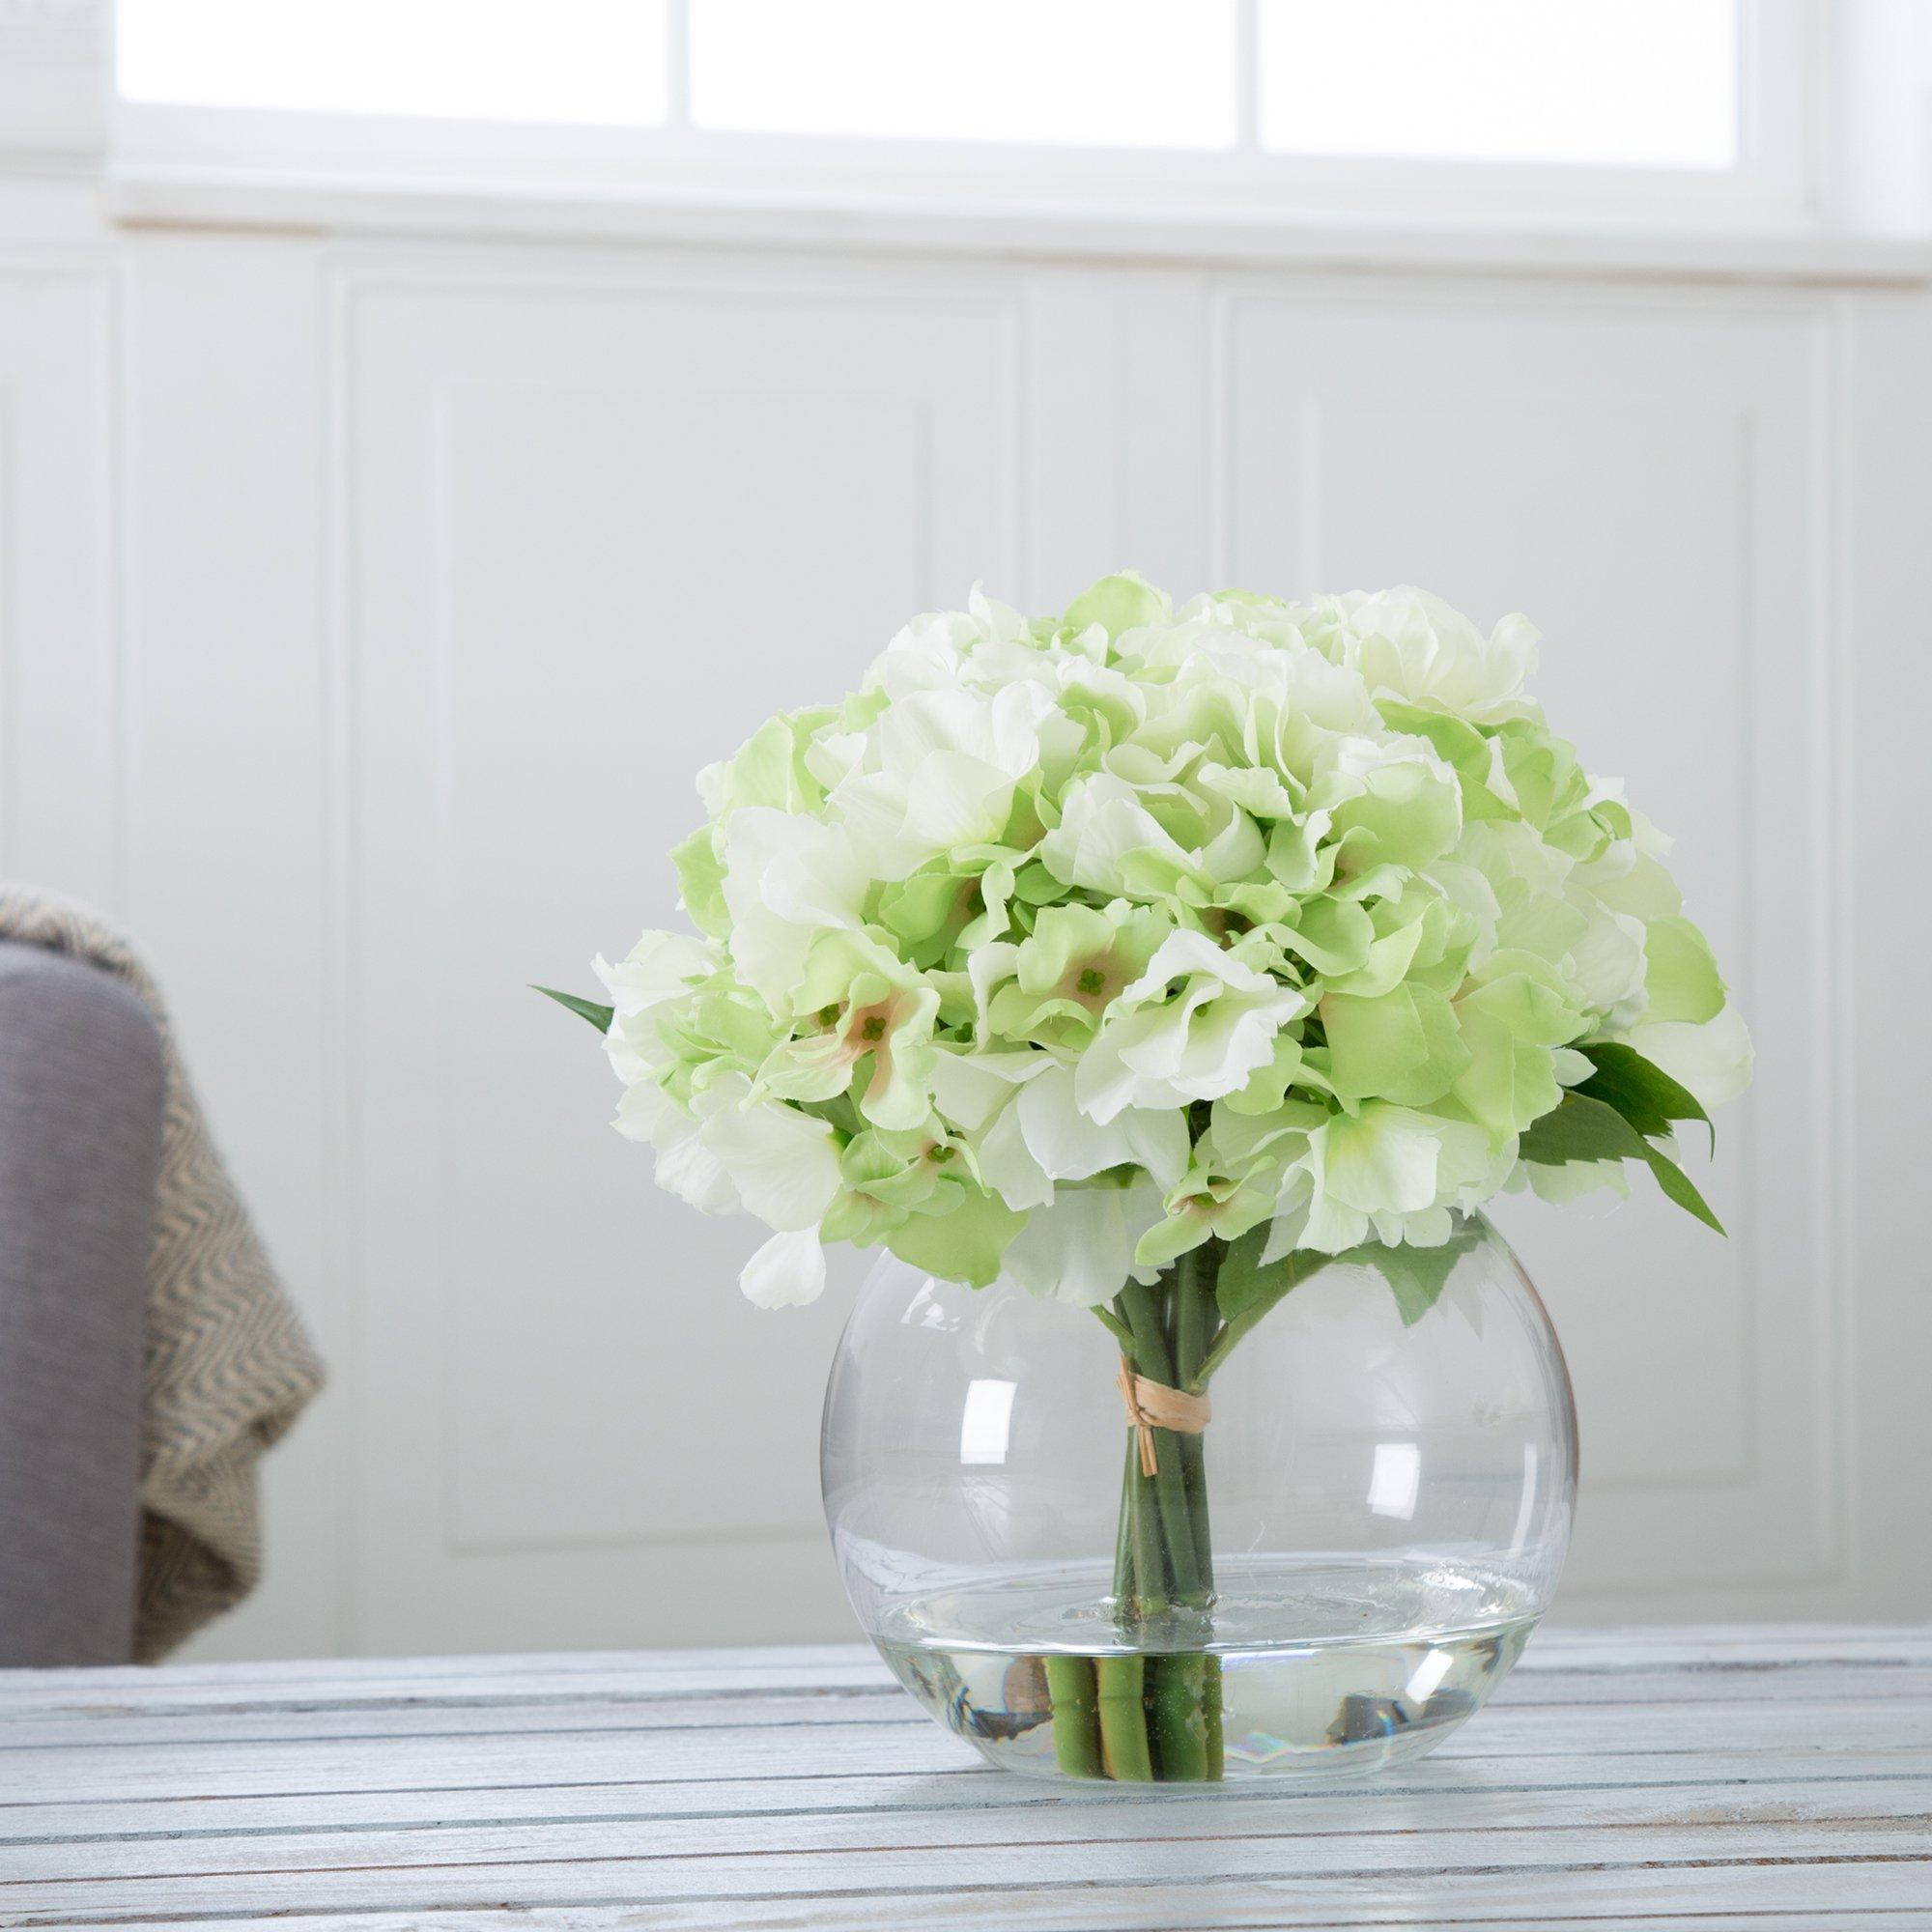 Amazon & Artificial Flower Arrangements in Vase: Amazon.com